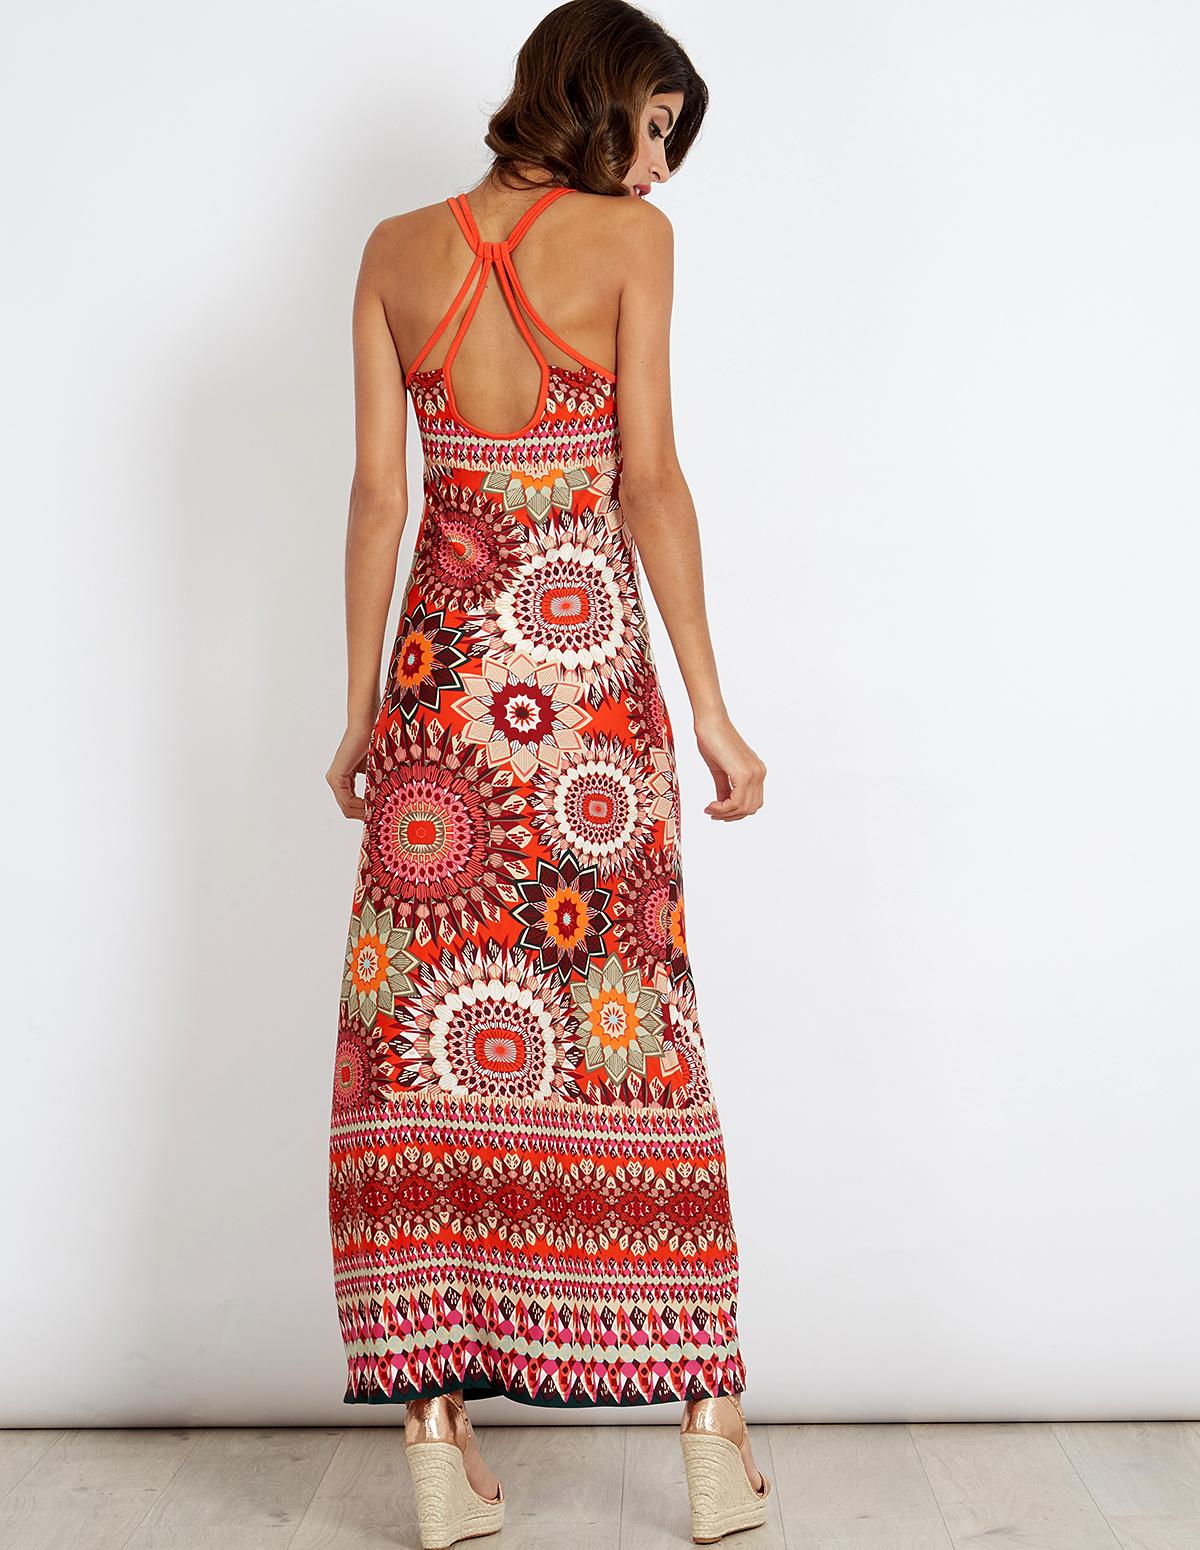 ZENAIDA - Geometric Floral Maxi Dress - Blue Vanilla